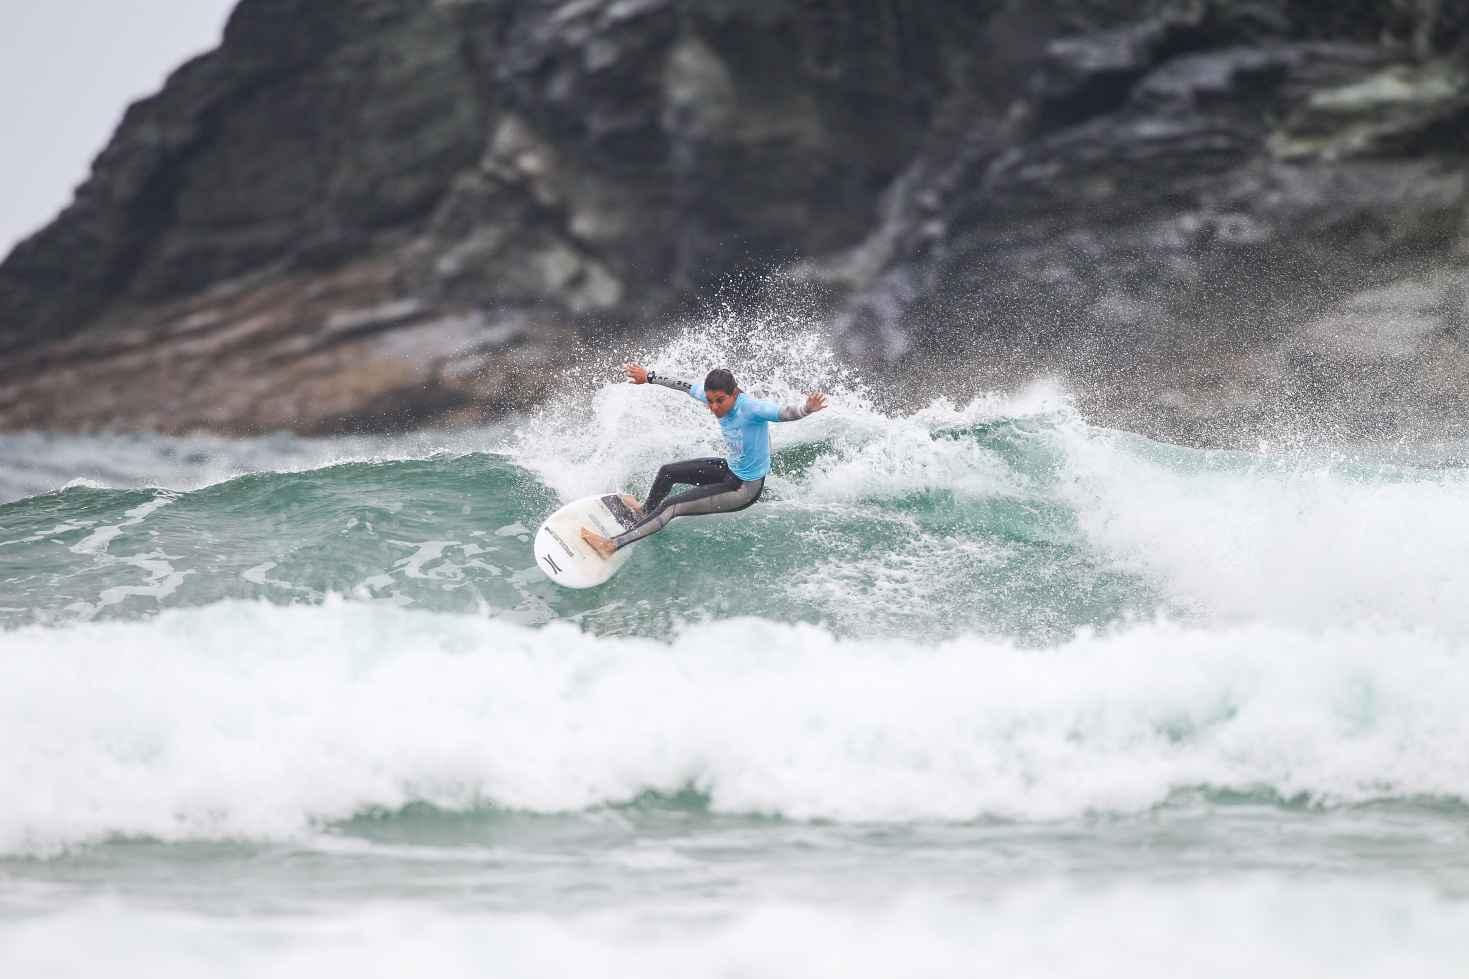 surf30 pantin classic 2021 wsl surf Carolina Mendes 9465PantinClassic2021Masurel